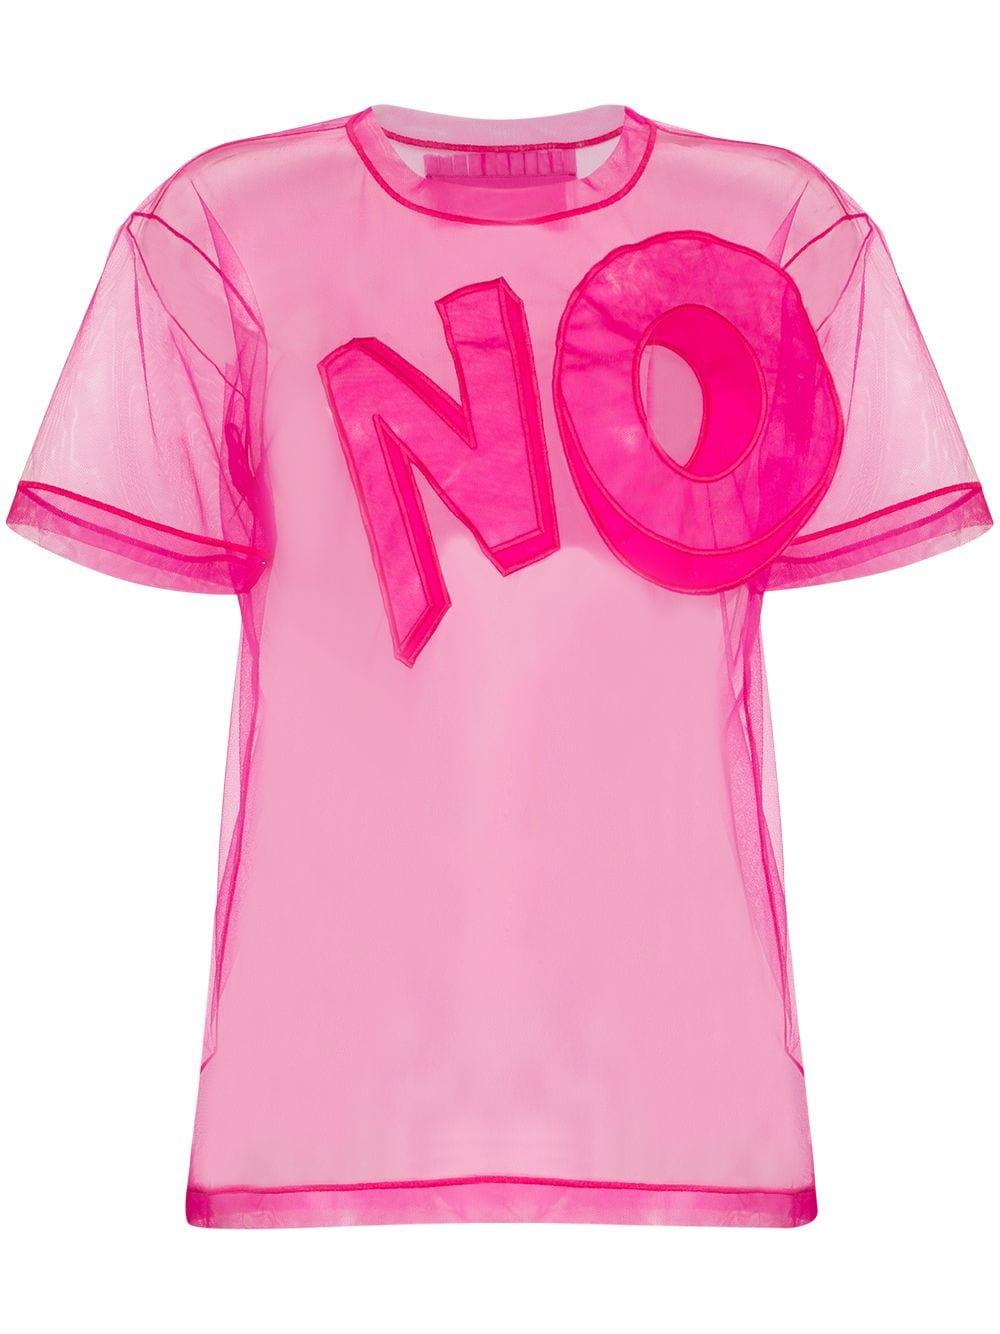 Viktor & Rolf No-Appliqué Mesh T-Shirt